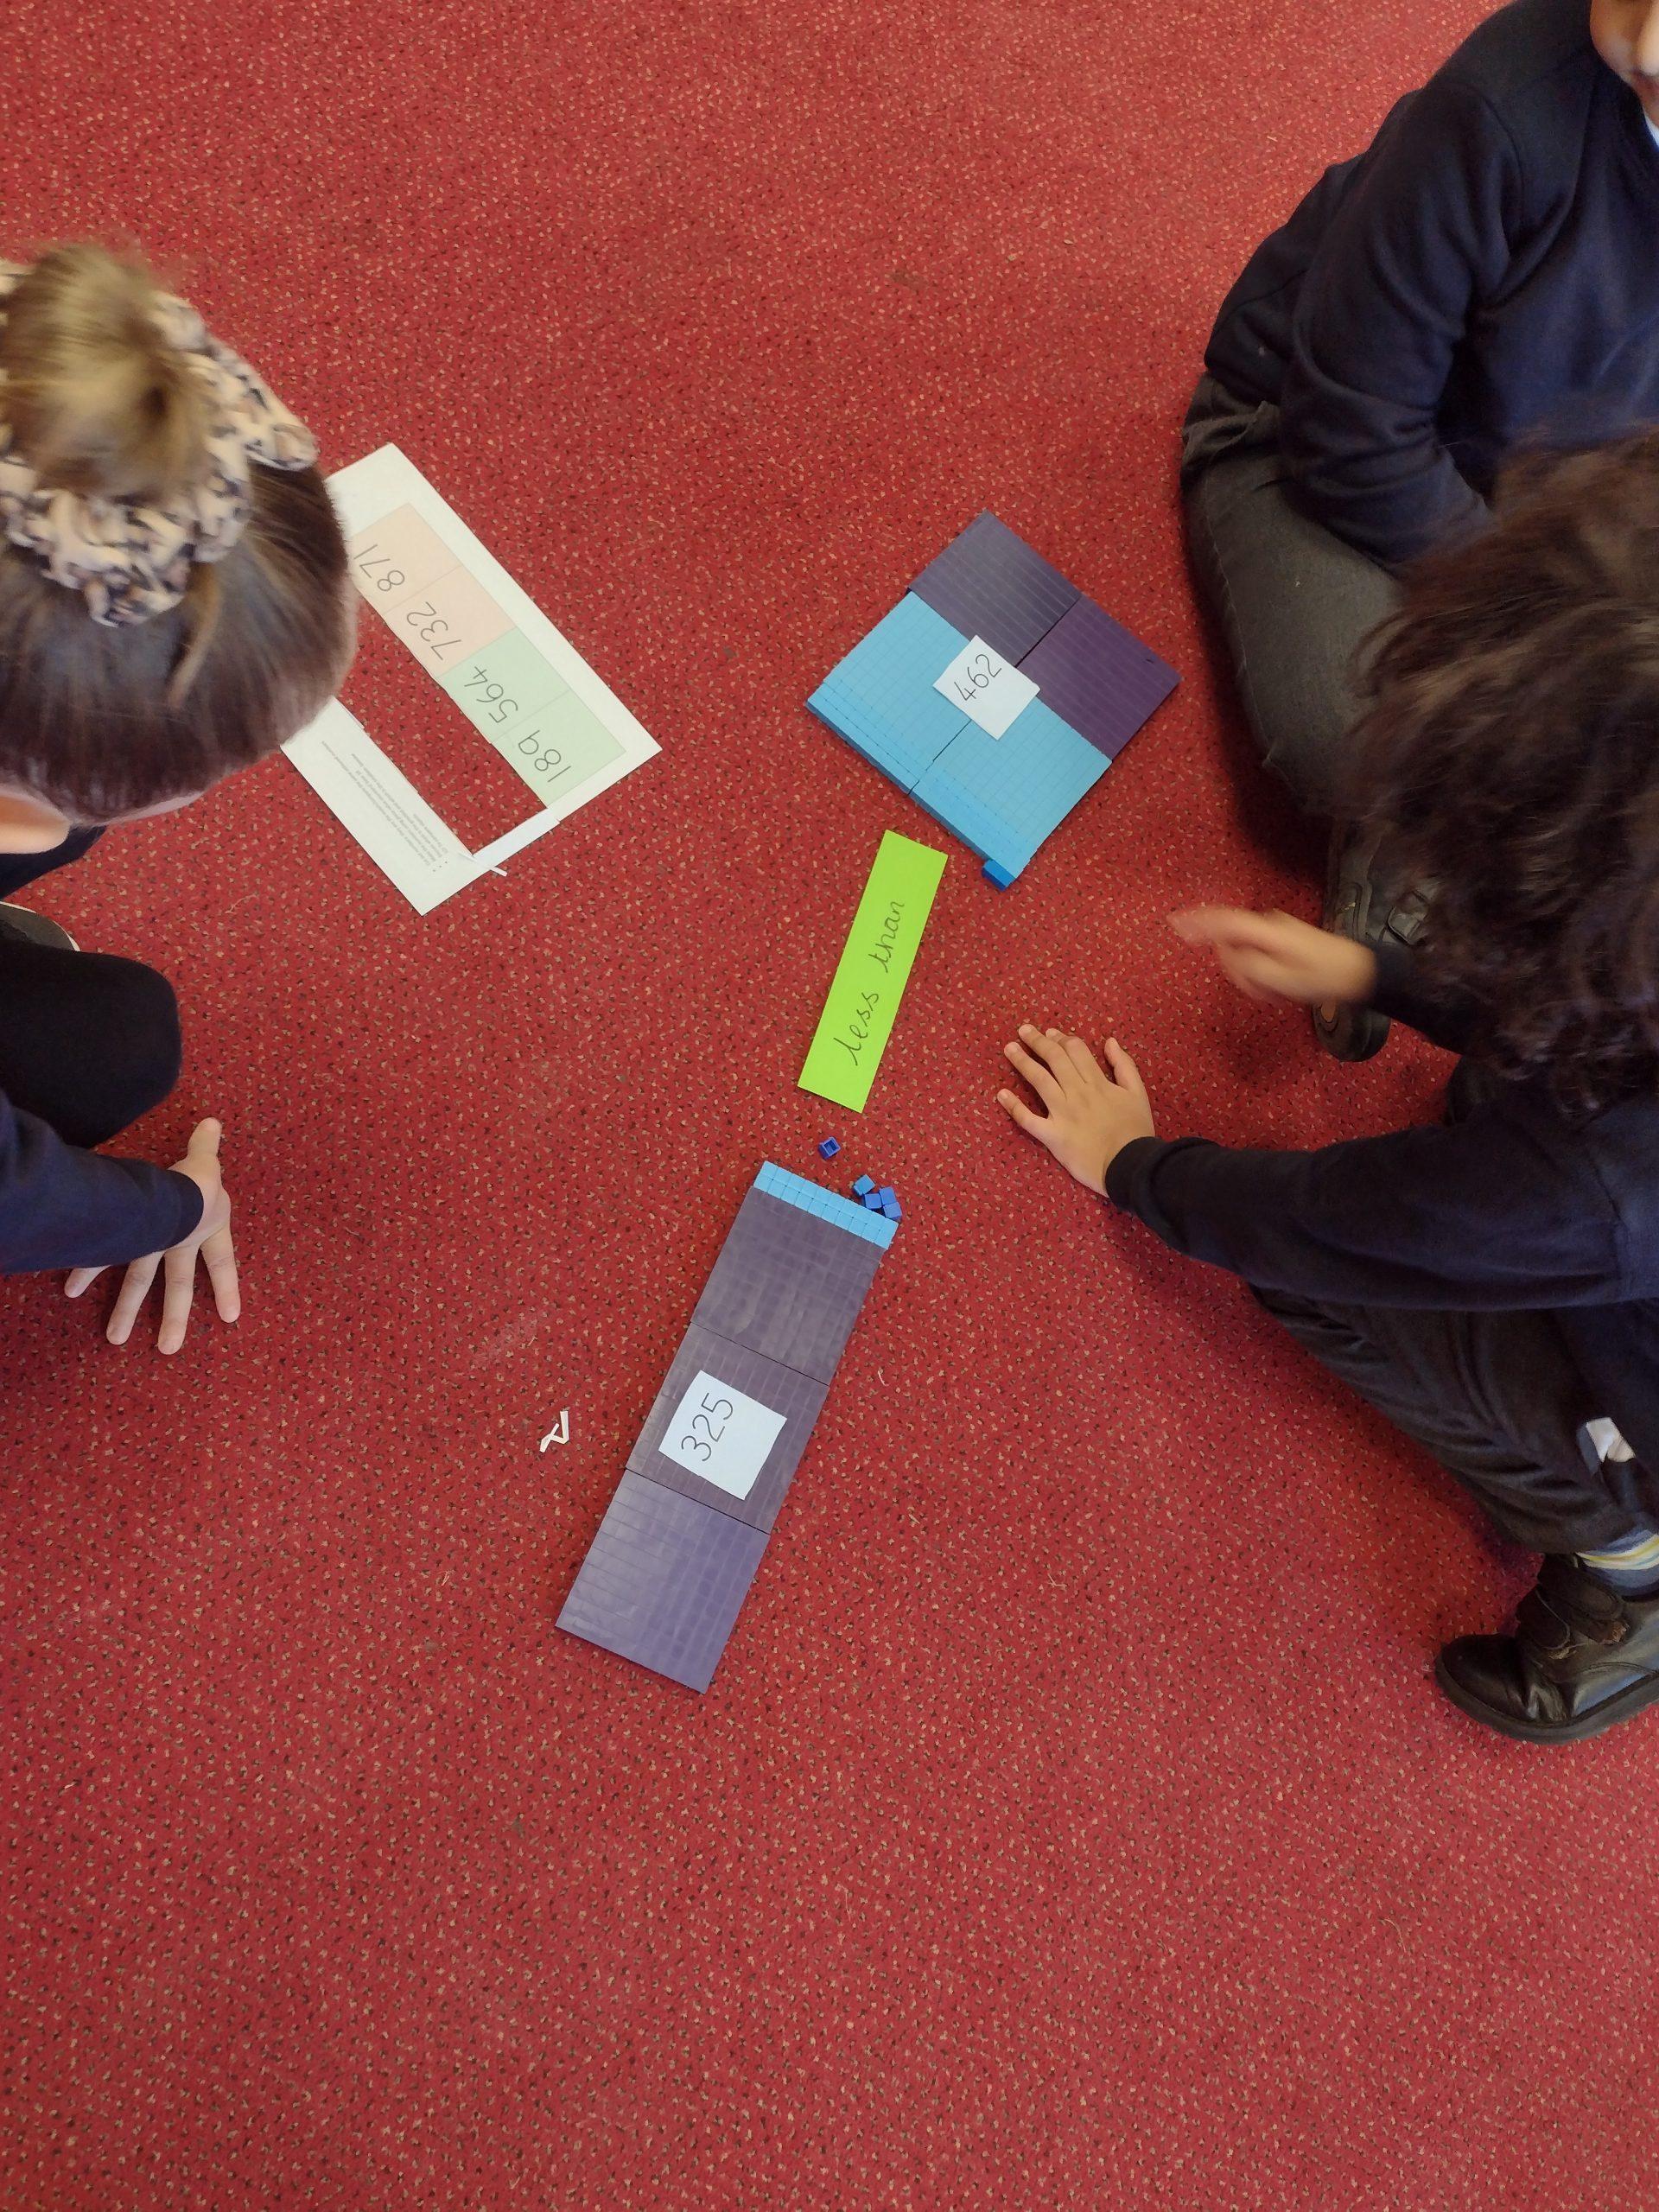 Year 3 children enjoying their practical maths lesson